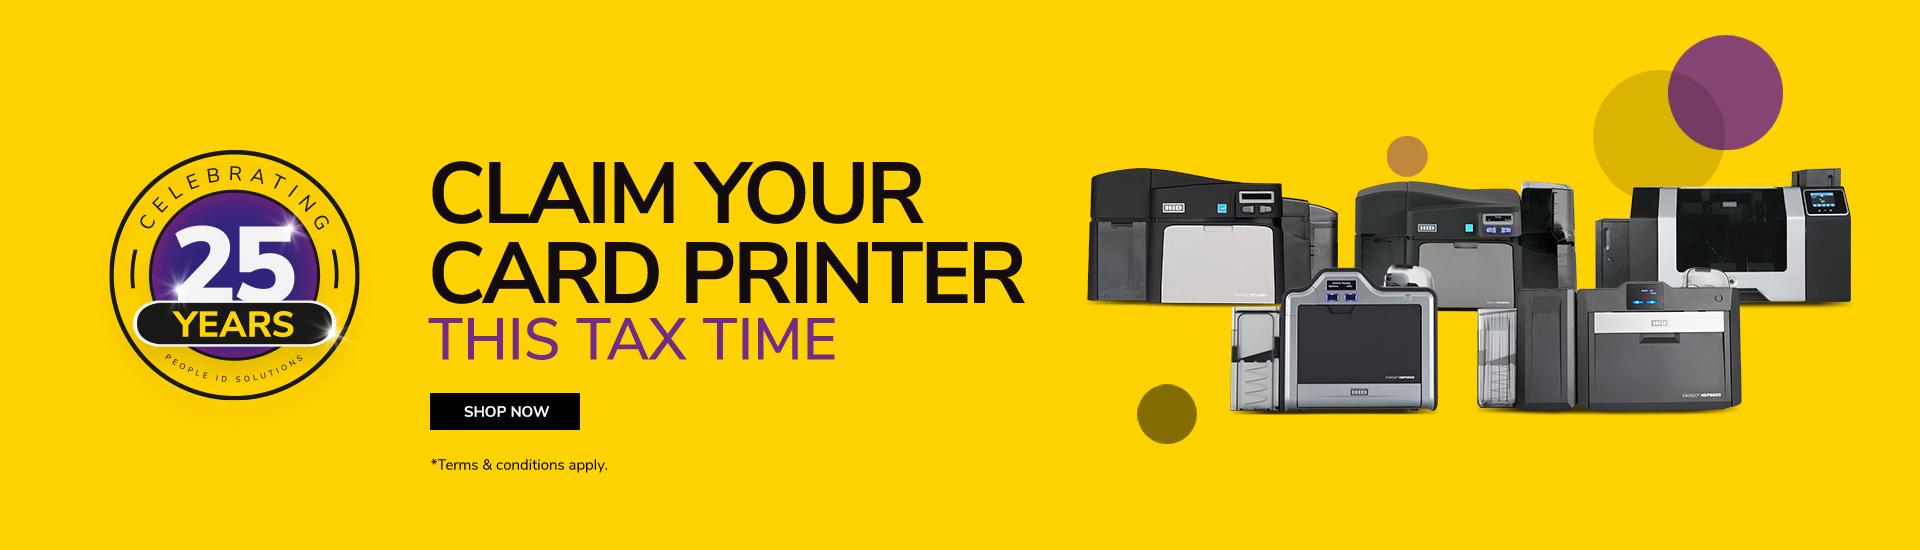 EOFY Printer